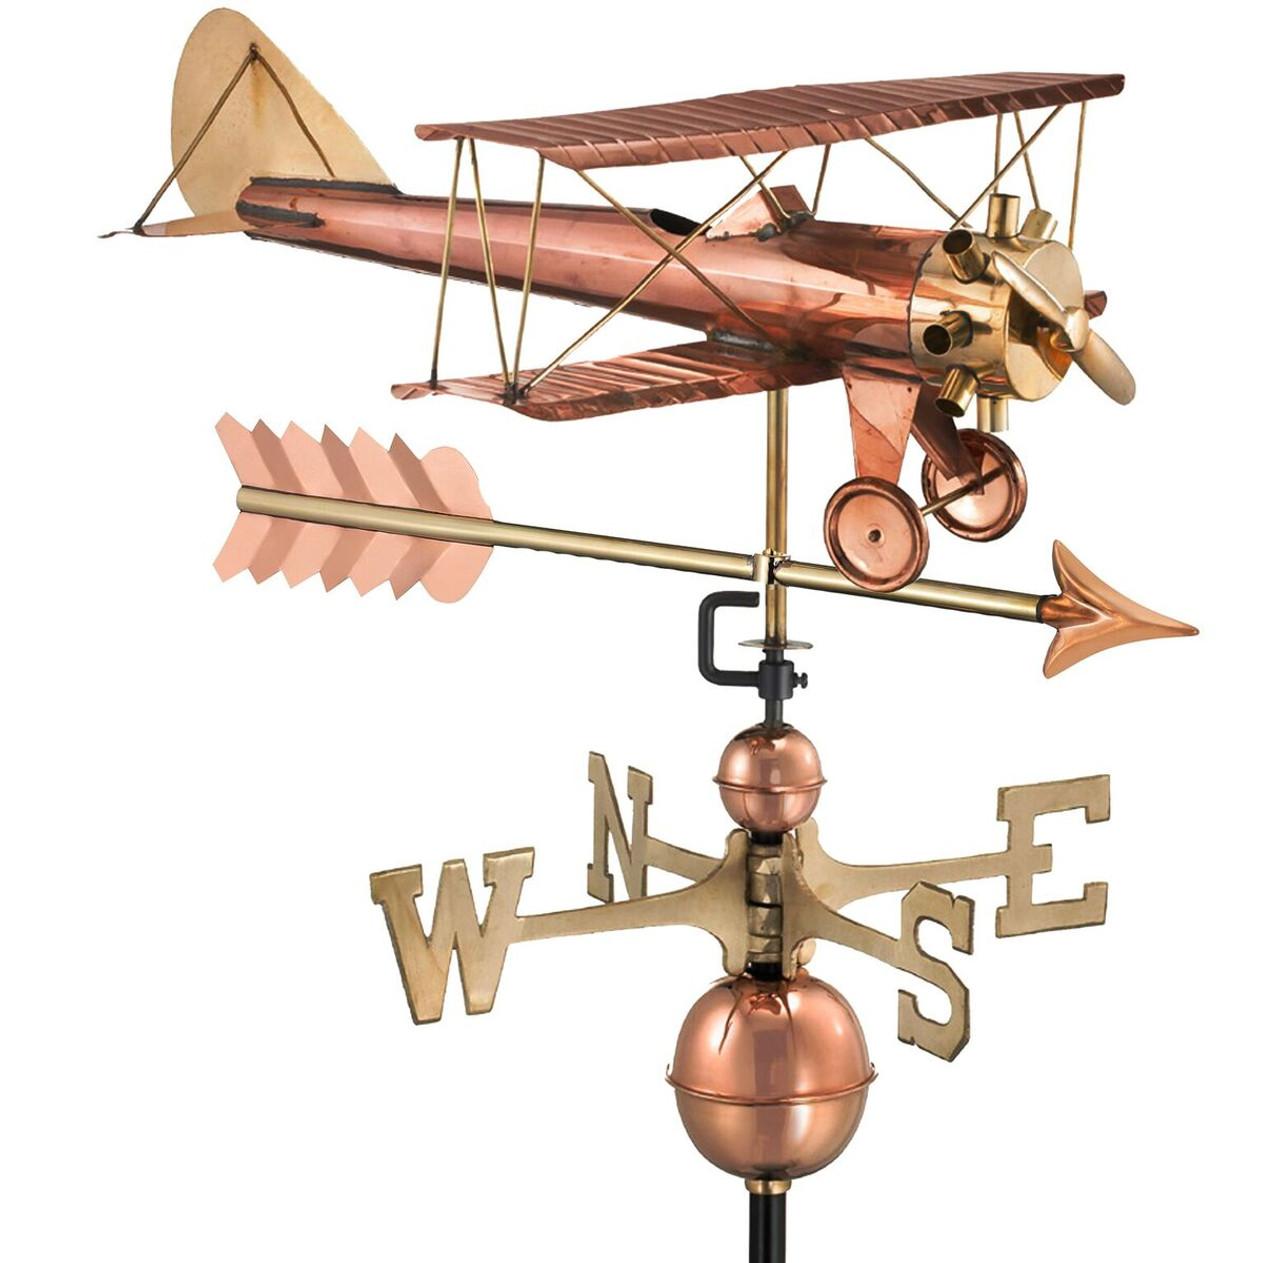 Biplane with Arrow Weathervane